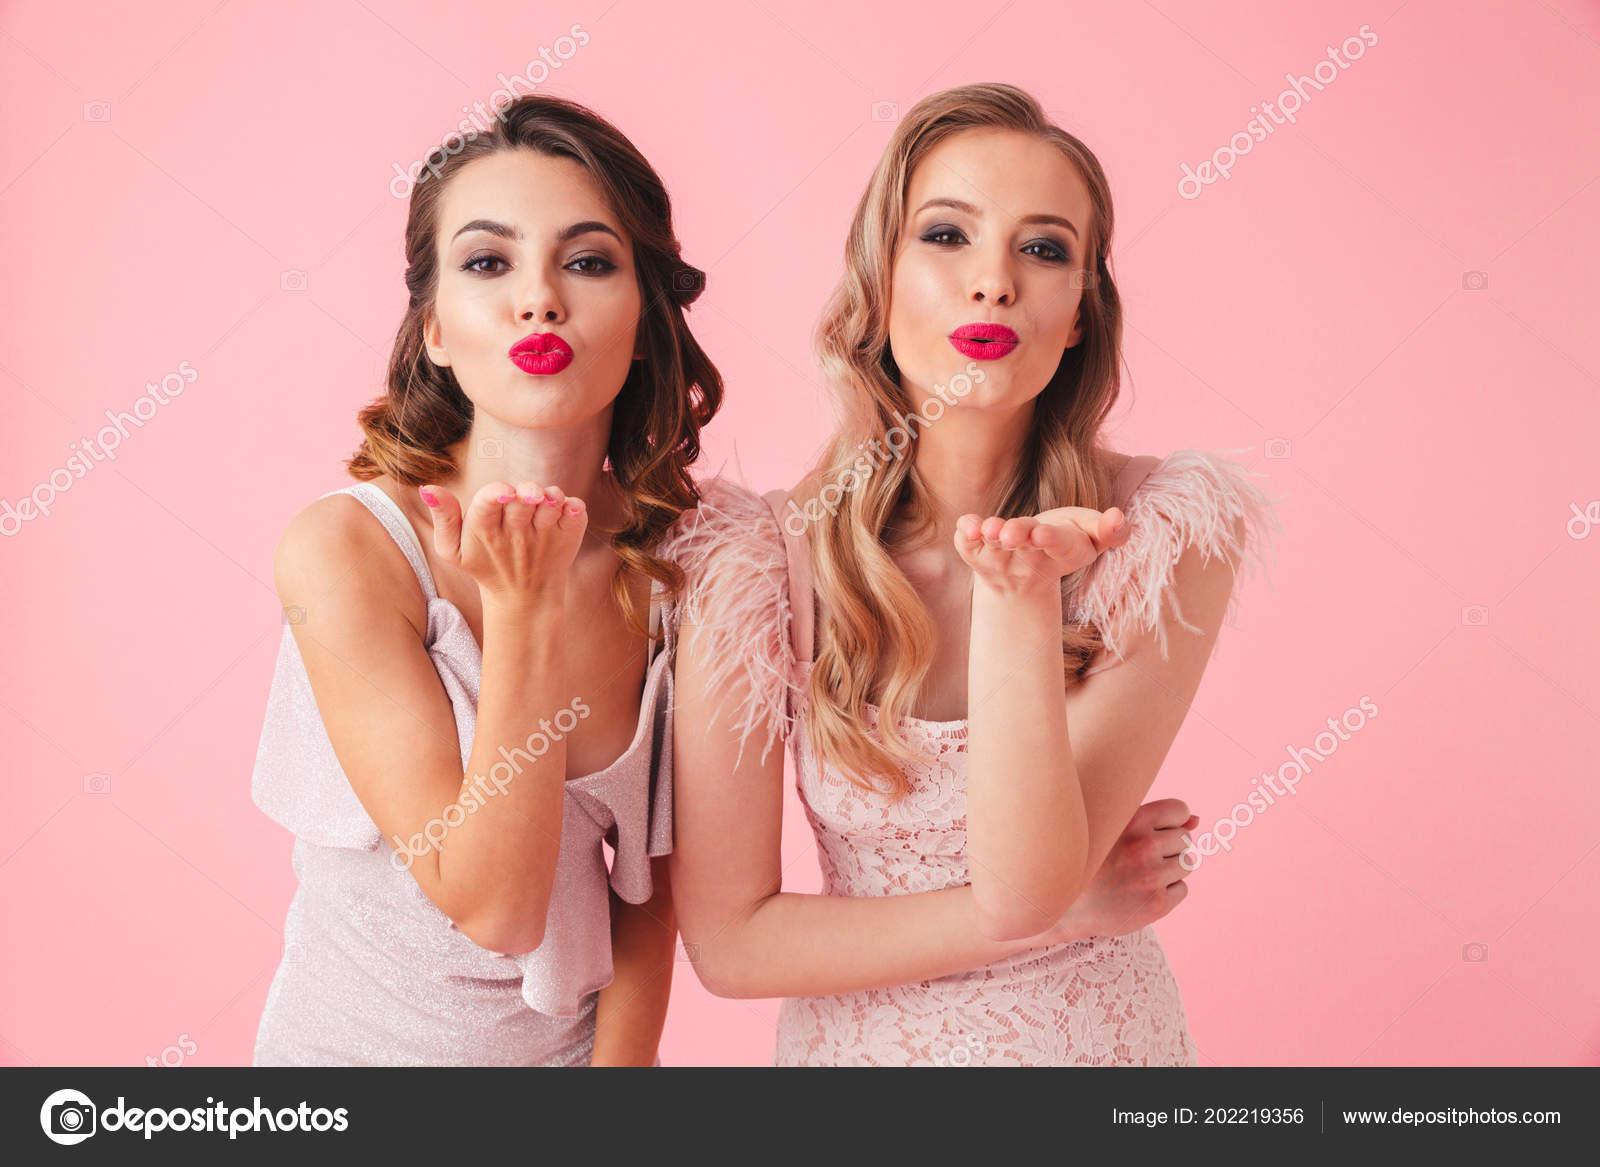 7710dfef45e7 Δύο γυναίκες σε φορέματα ποζάρει μαζί ενώ στέλνει αέρα φιλιά και  εξετάζοντας τη φωτογραφική μηχανή σε ροζ φόντο — Εικόνα από ...